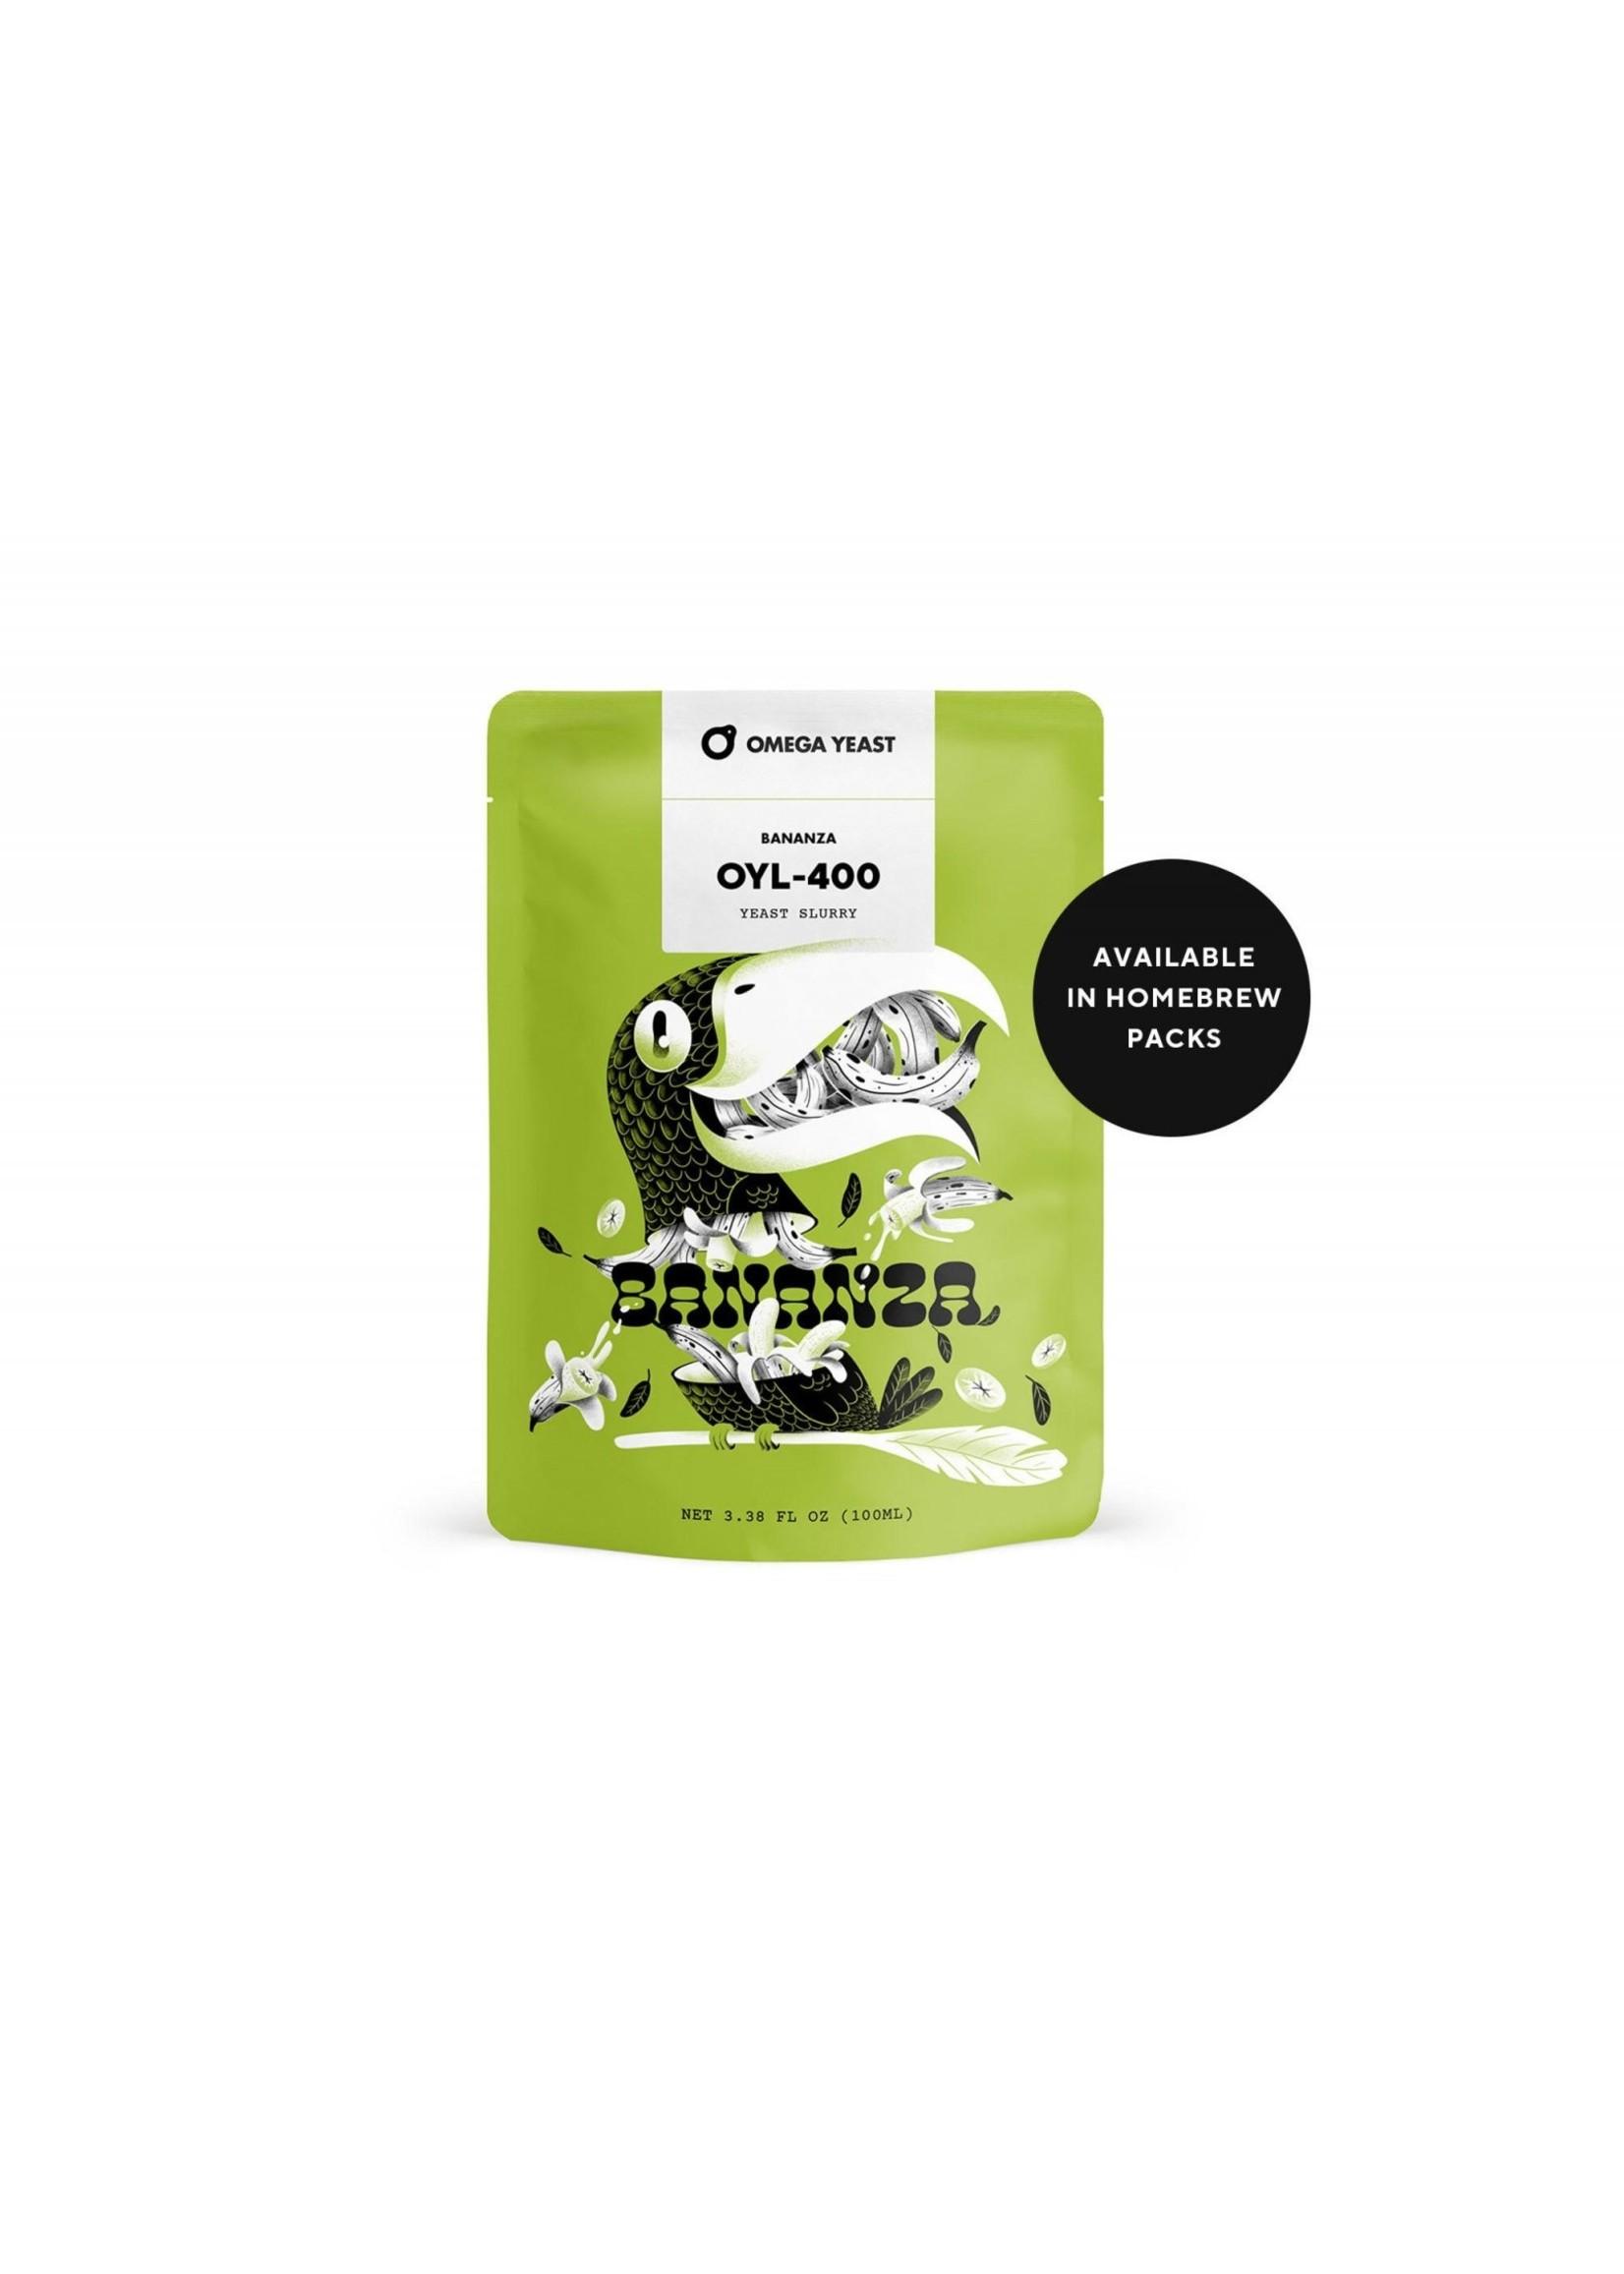 Yeast Omega Yeast Labs - OYL400- Bananza Ale